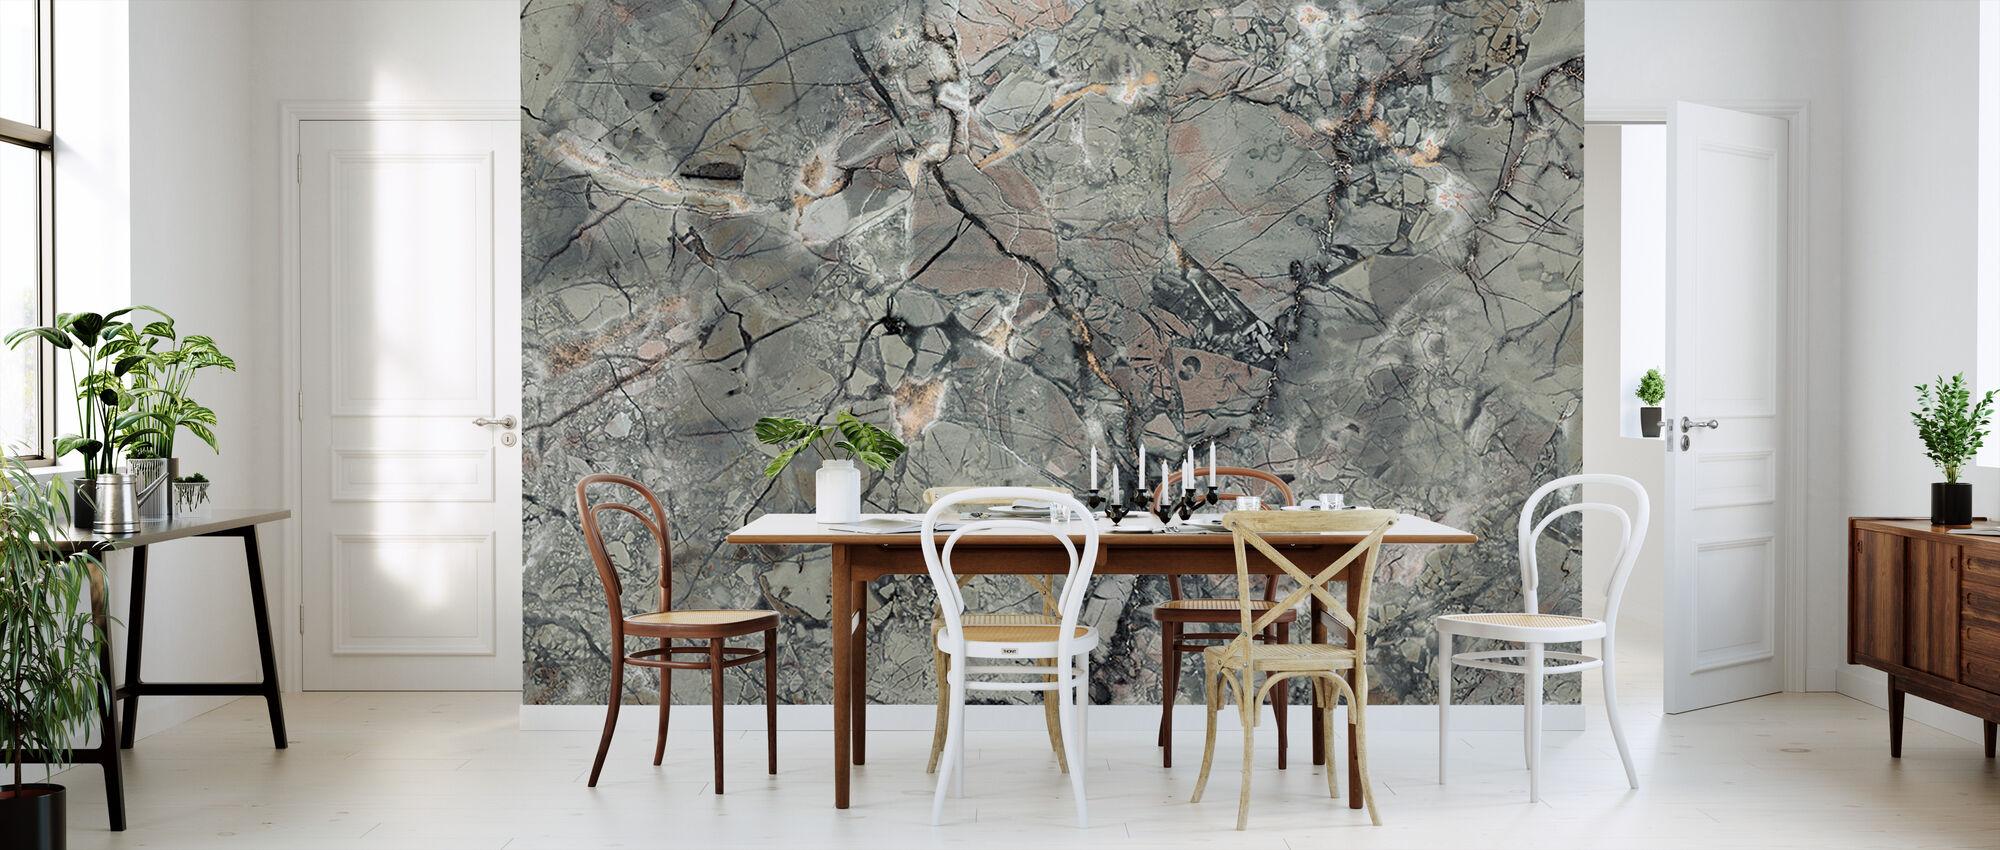 Marmorstruktur - Tapete - Küchen